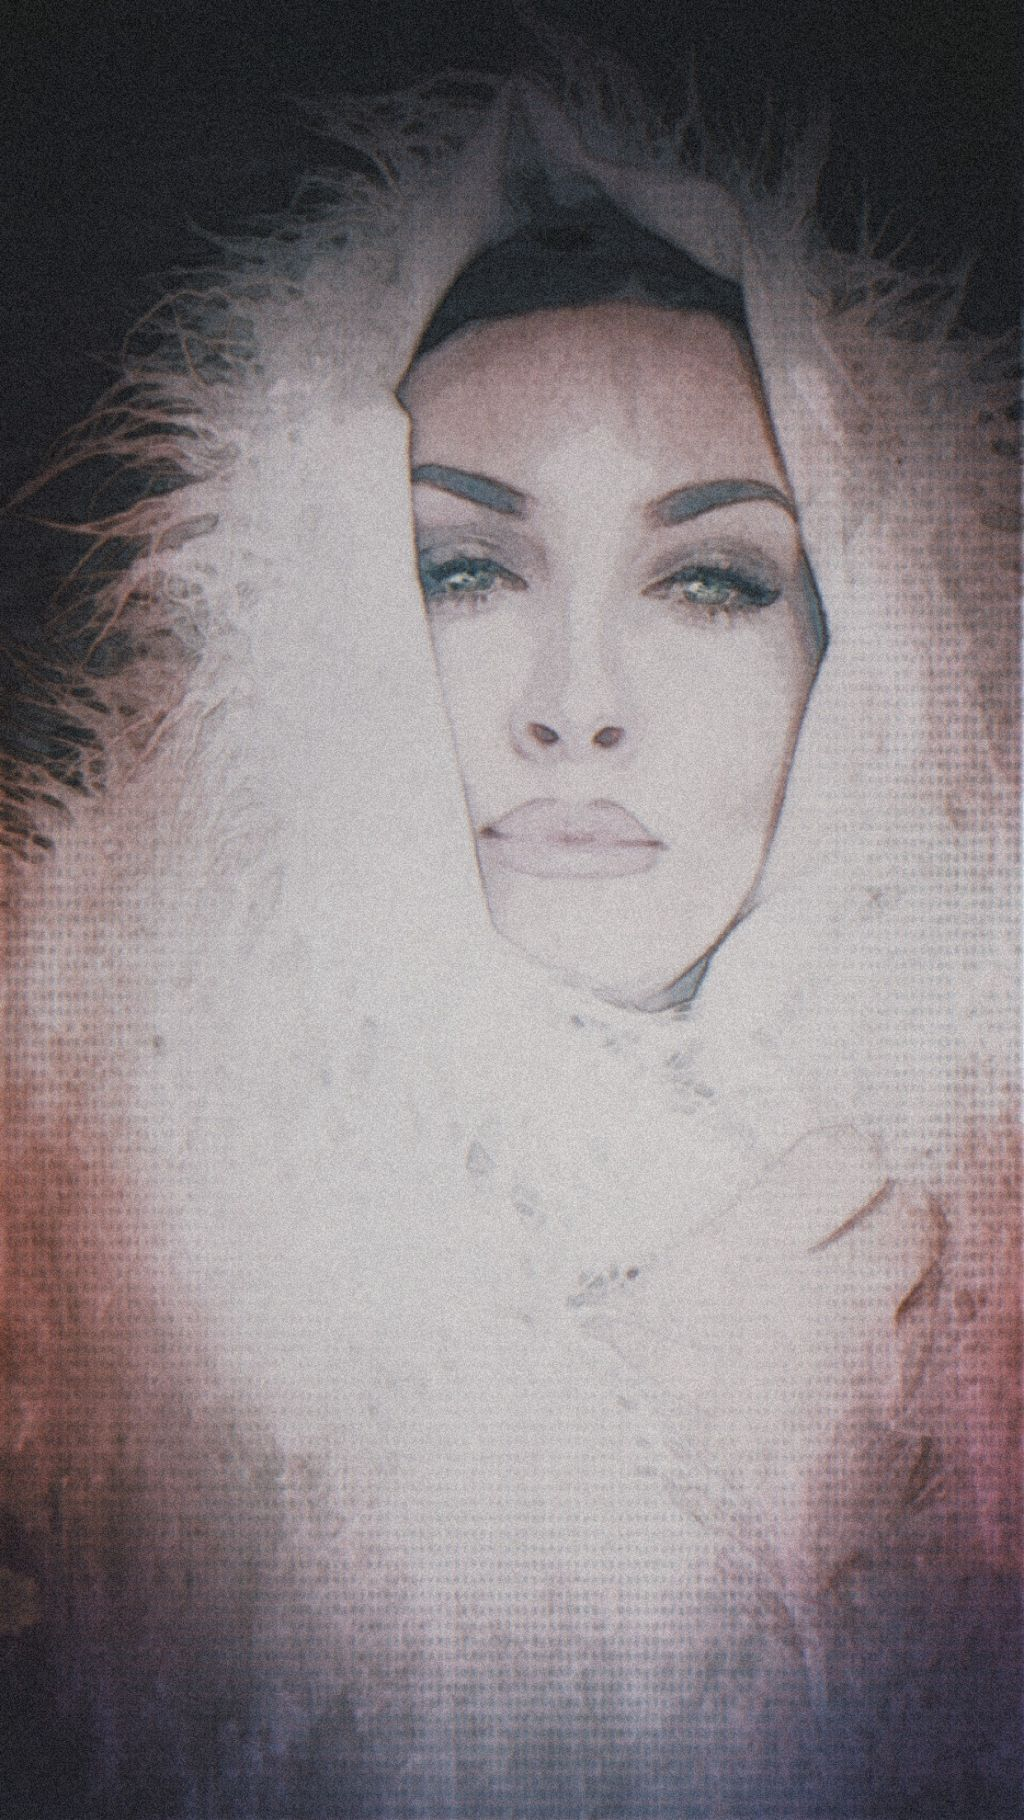 #vipshoutout for this pretty lady #freetoedit #artisticselfie #selfie